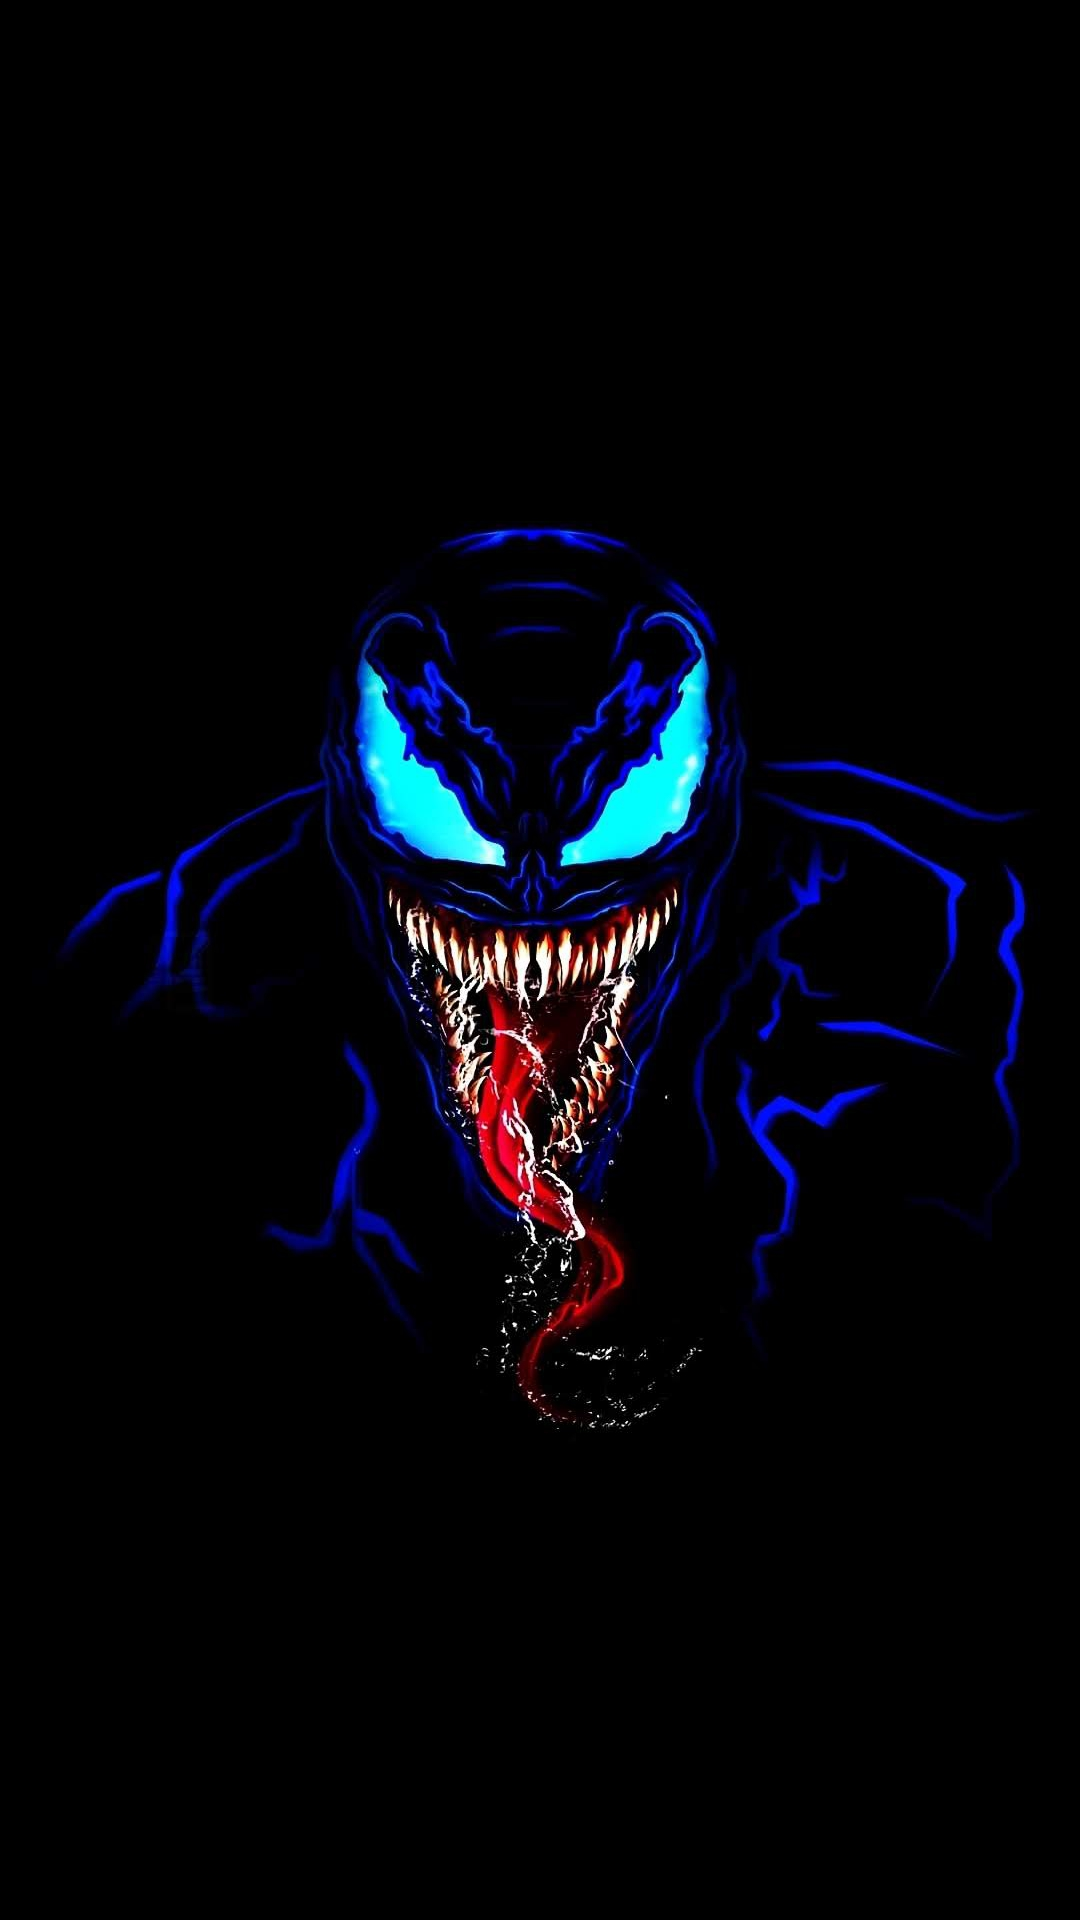 Venom in Dark iPhone Wallpaper